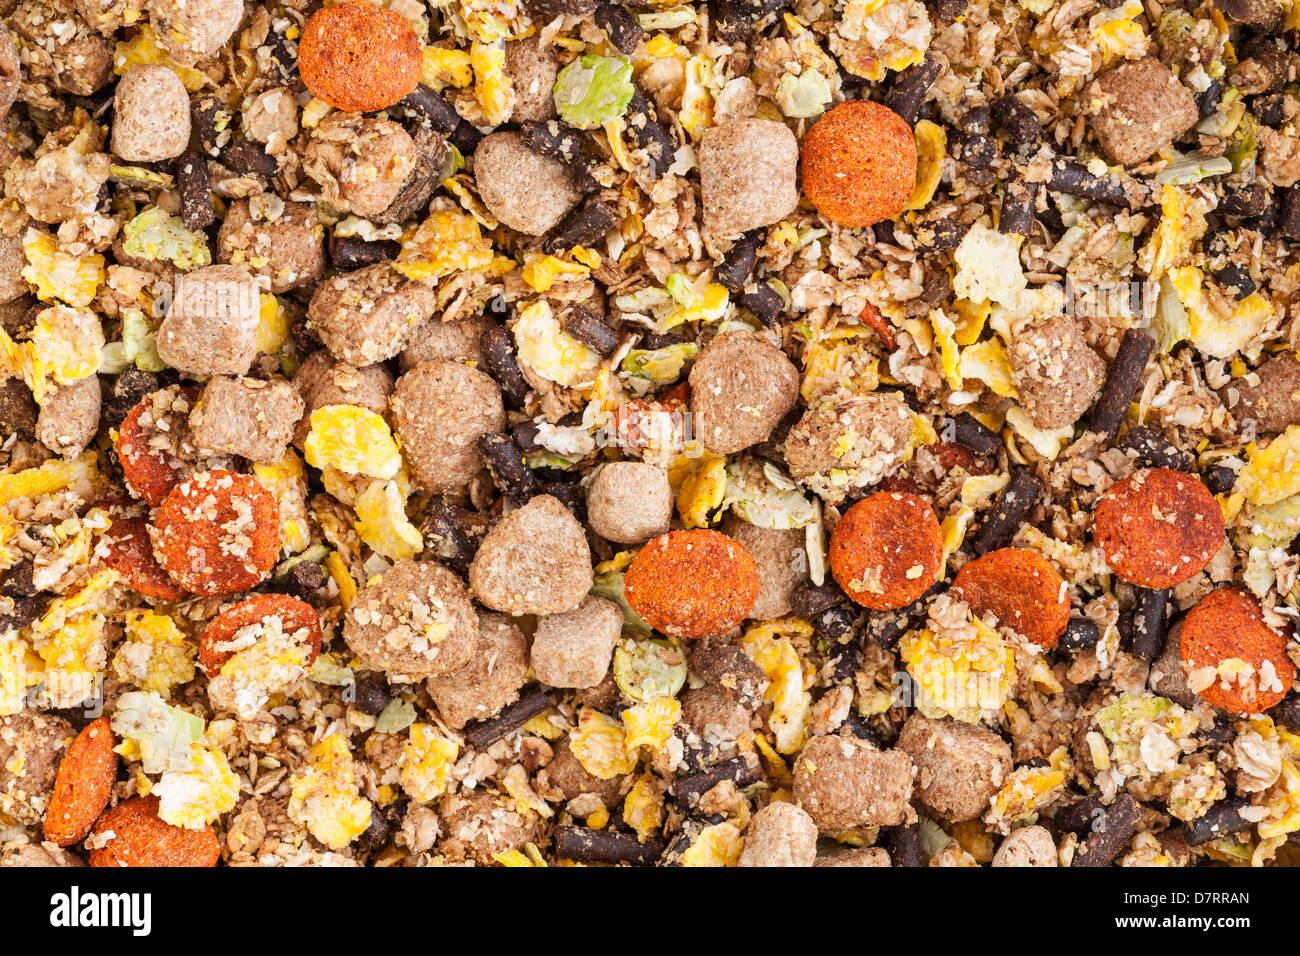 Dry mix dog food - Stock Image